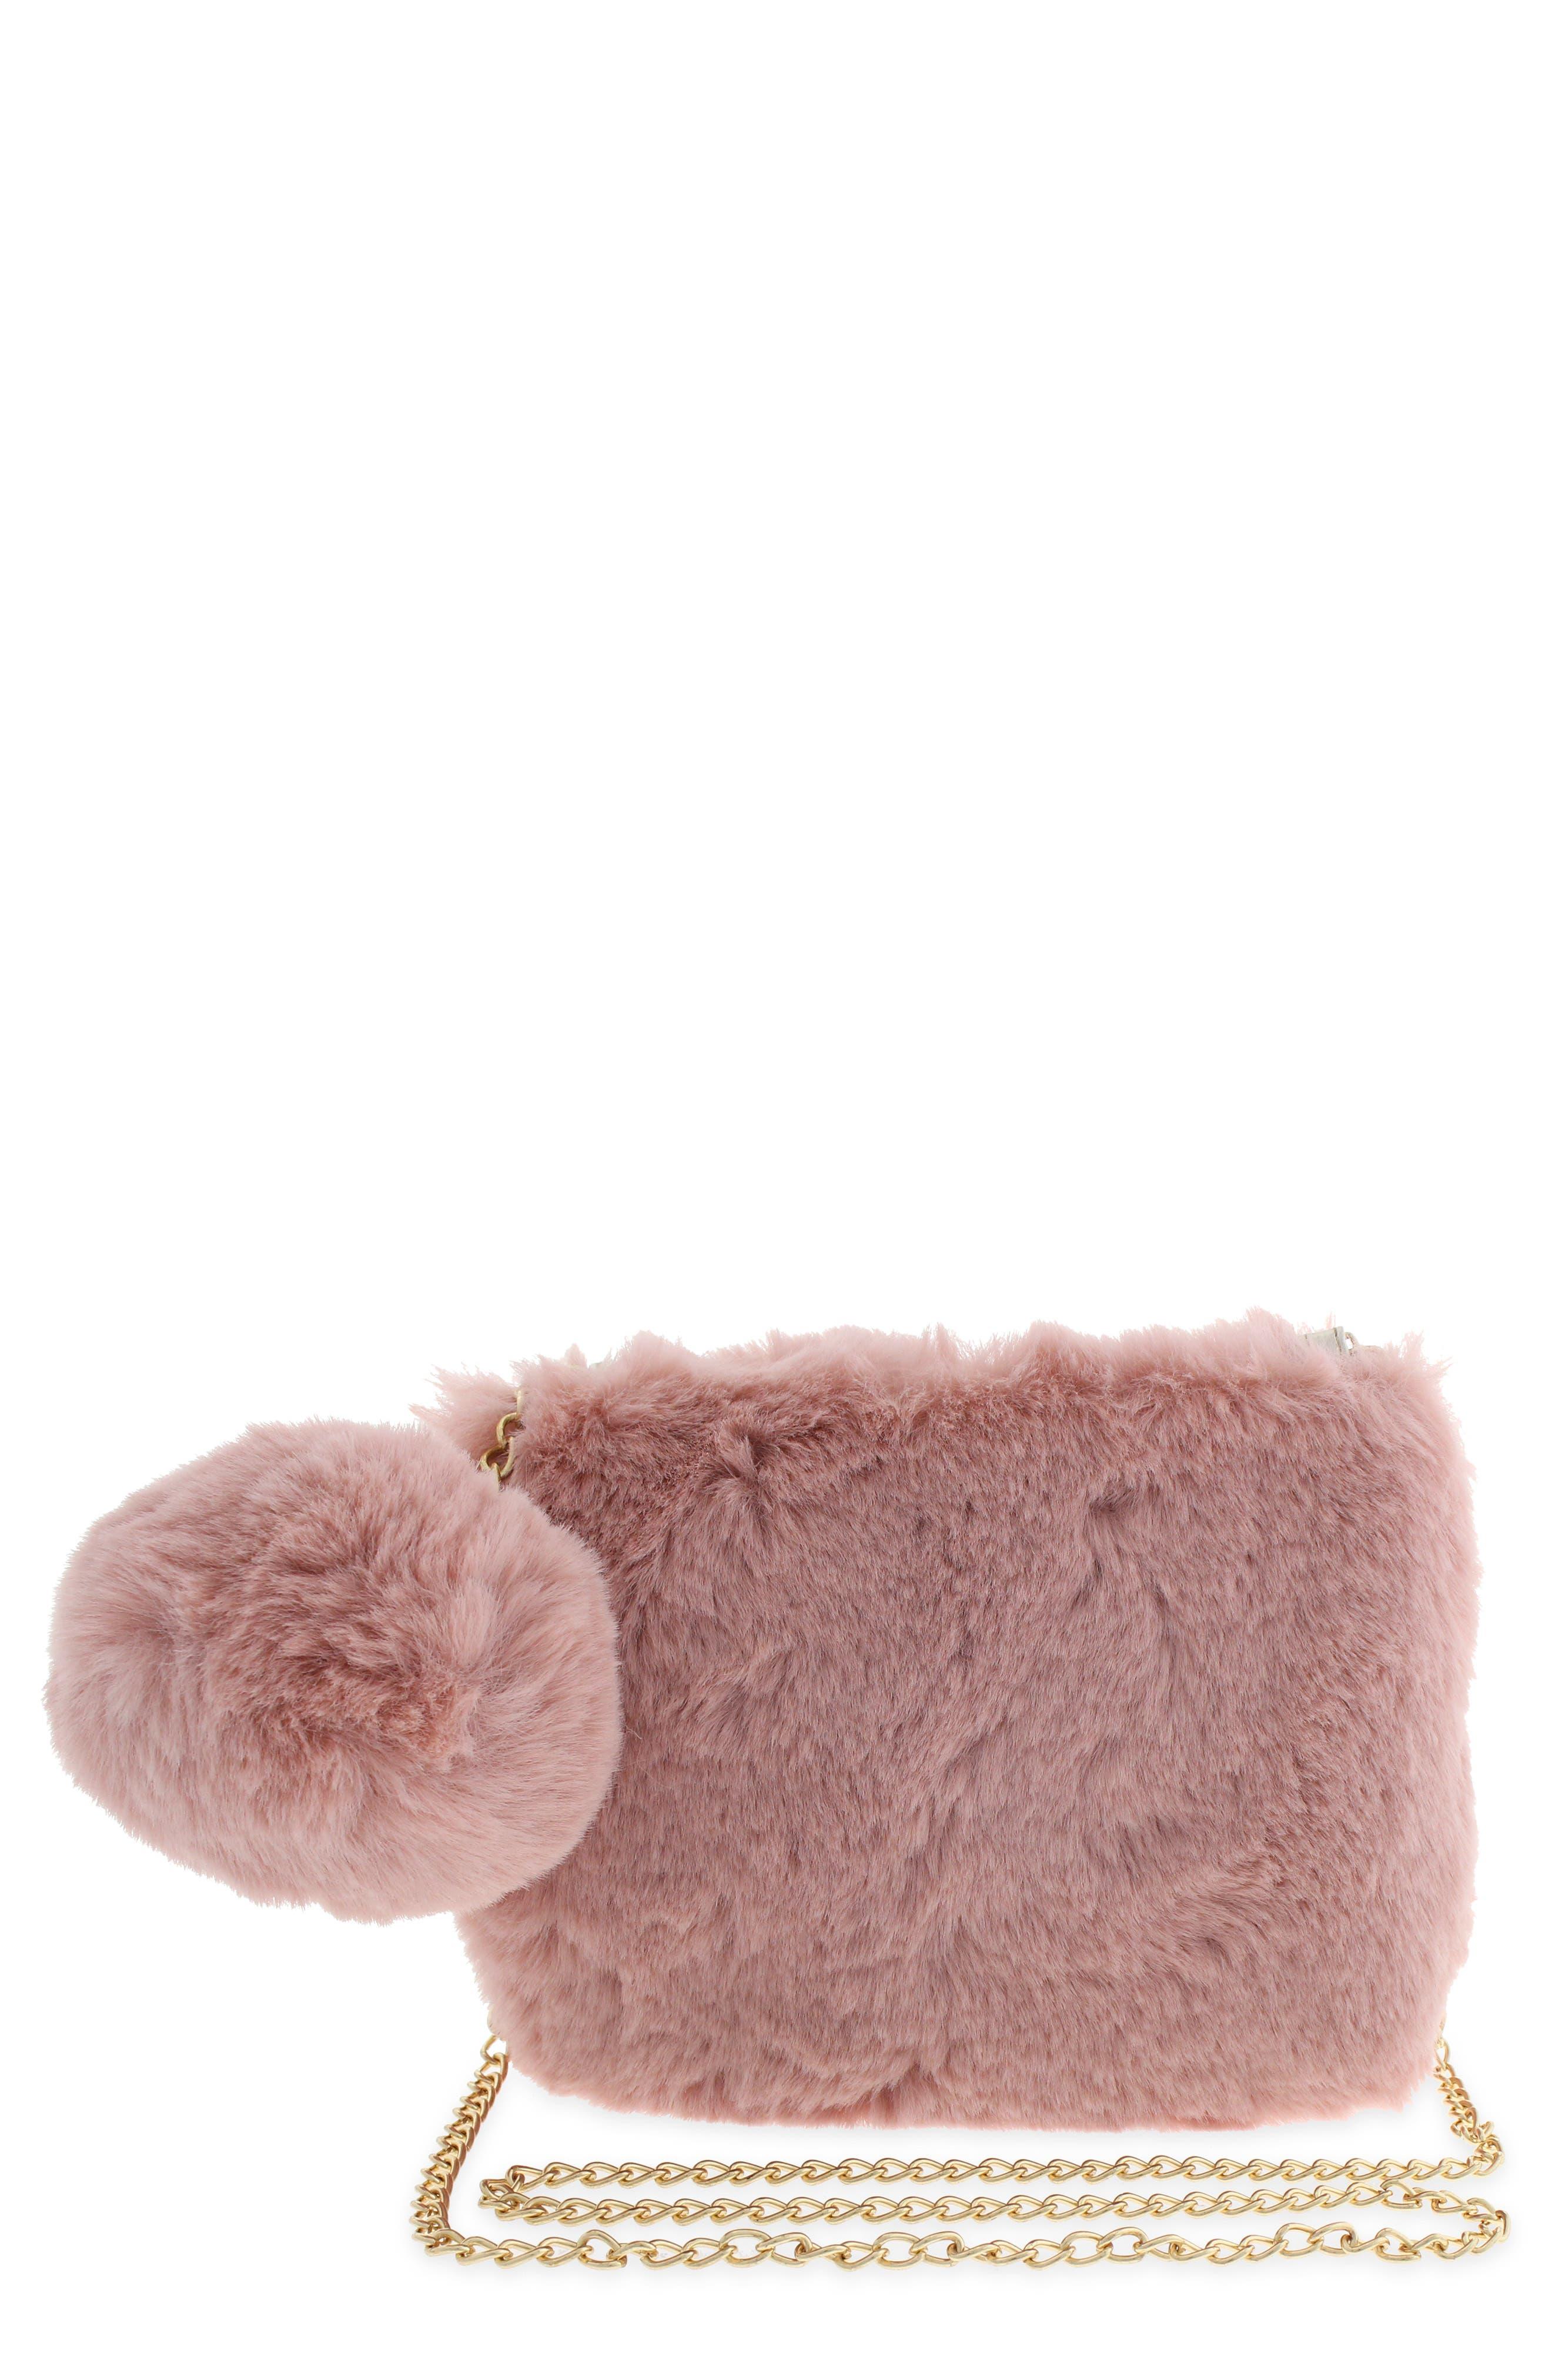 Girls Capelli New York Faux Fur Crossbody Bag